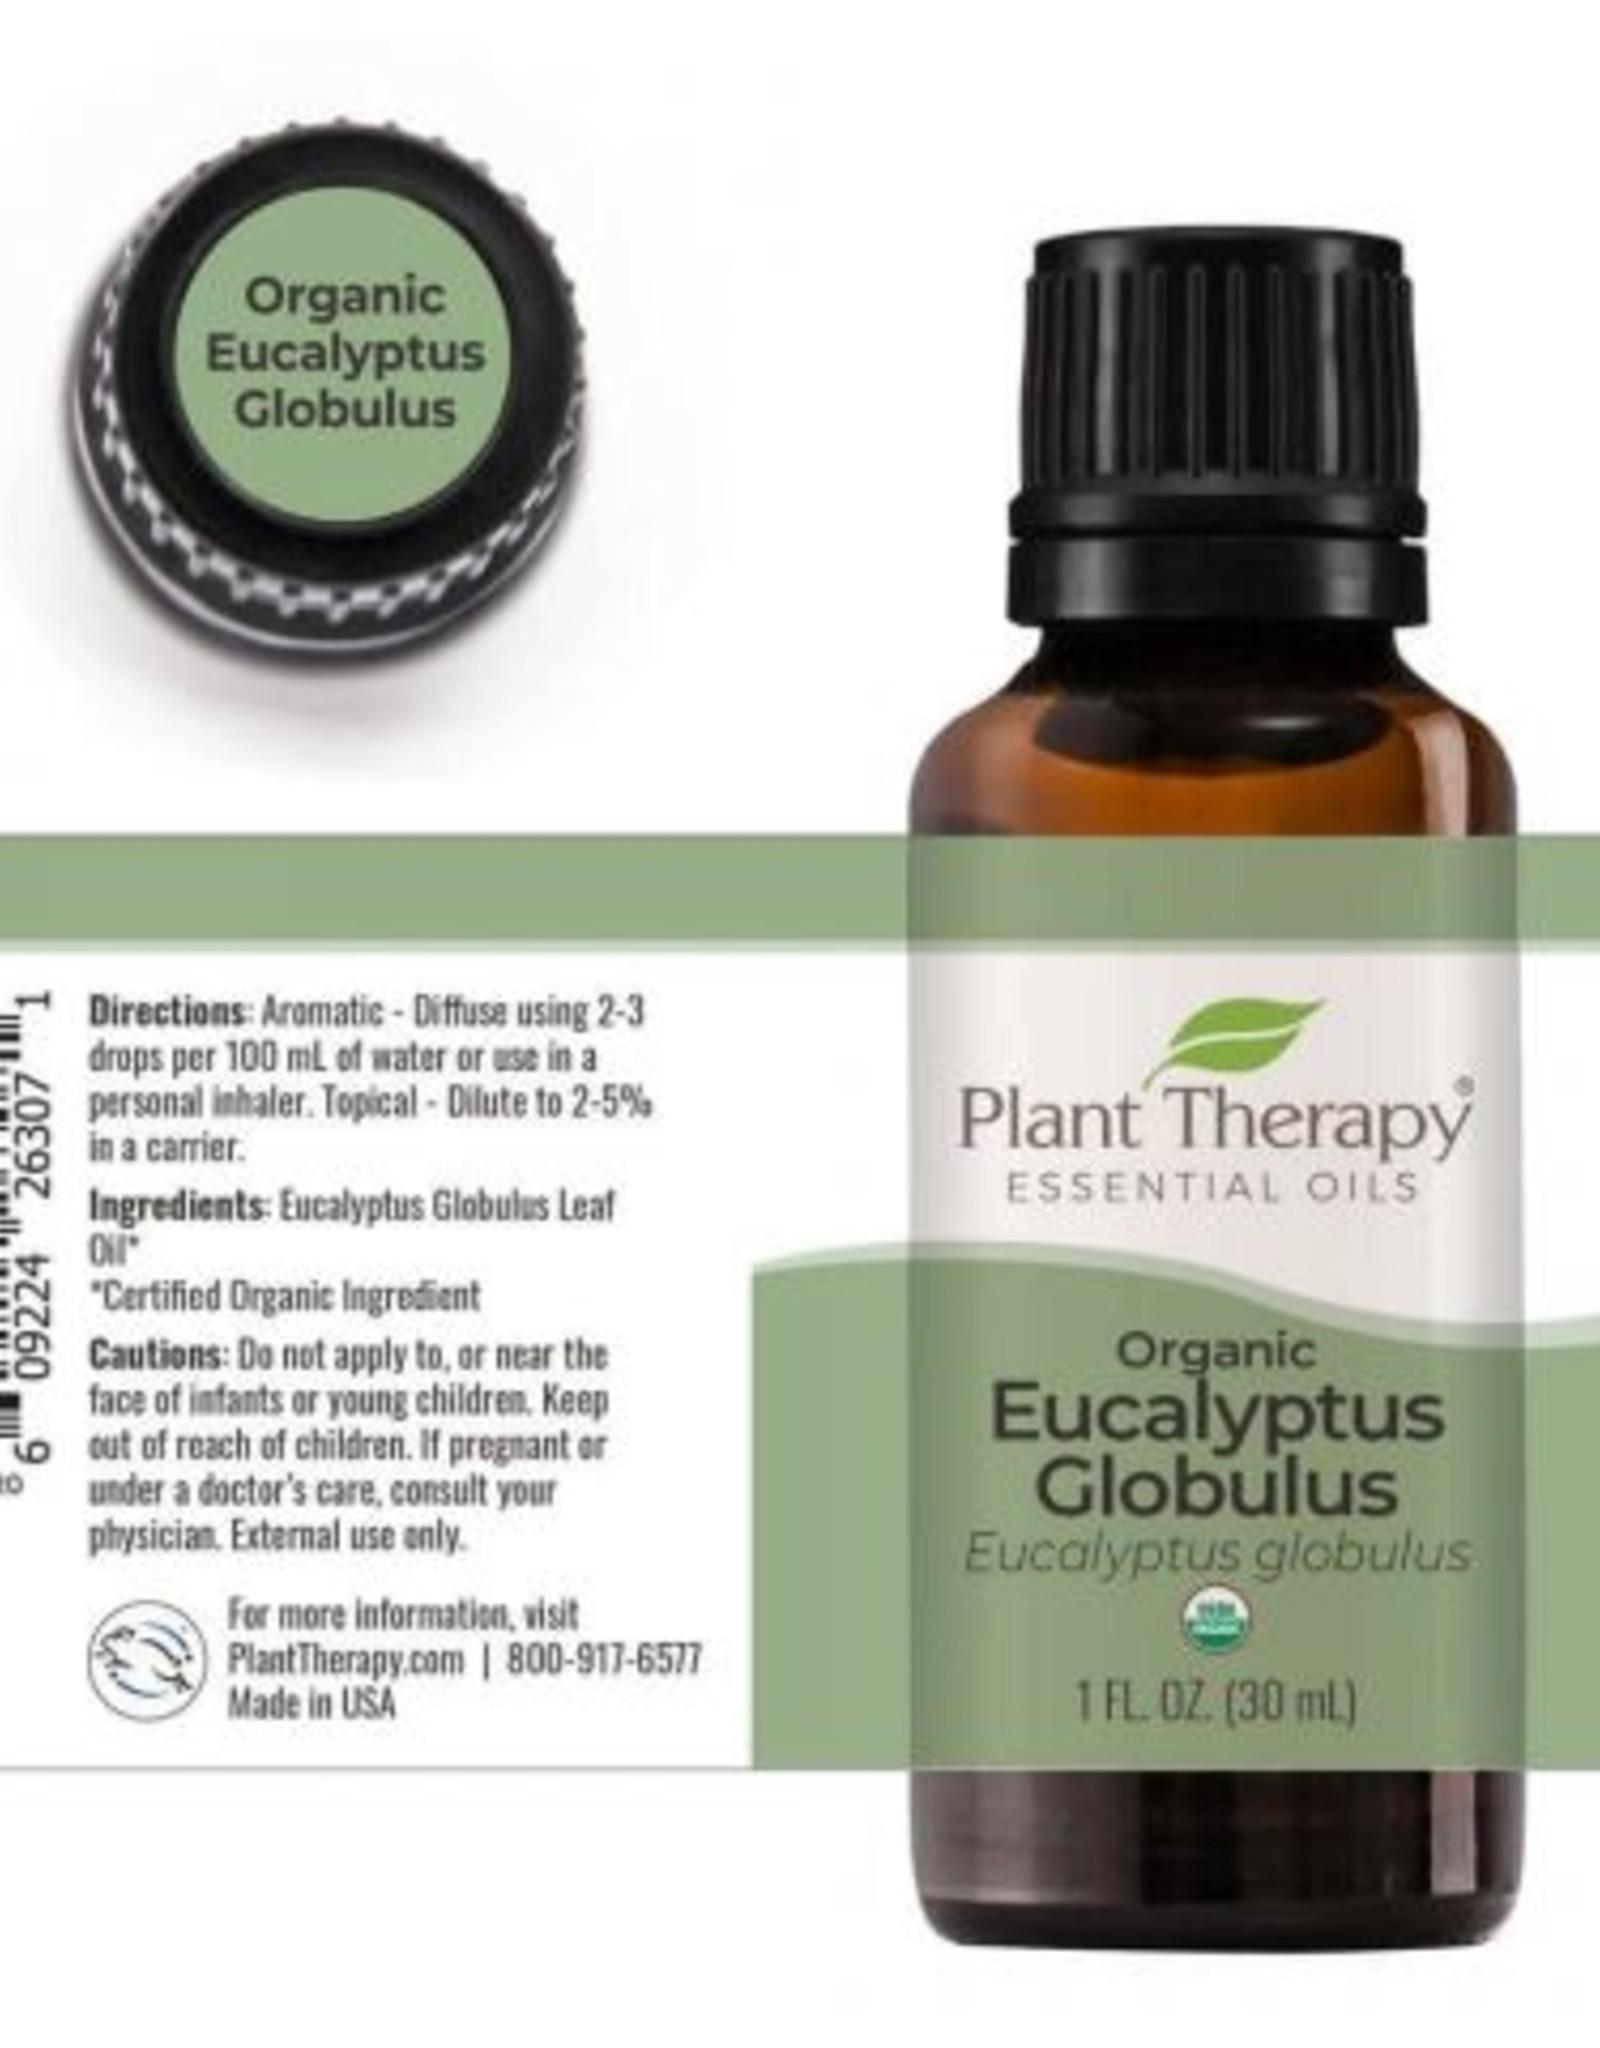 Plant Therapy Organic Eucalyptus Essential Oil 30ml